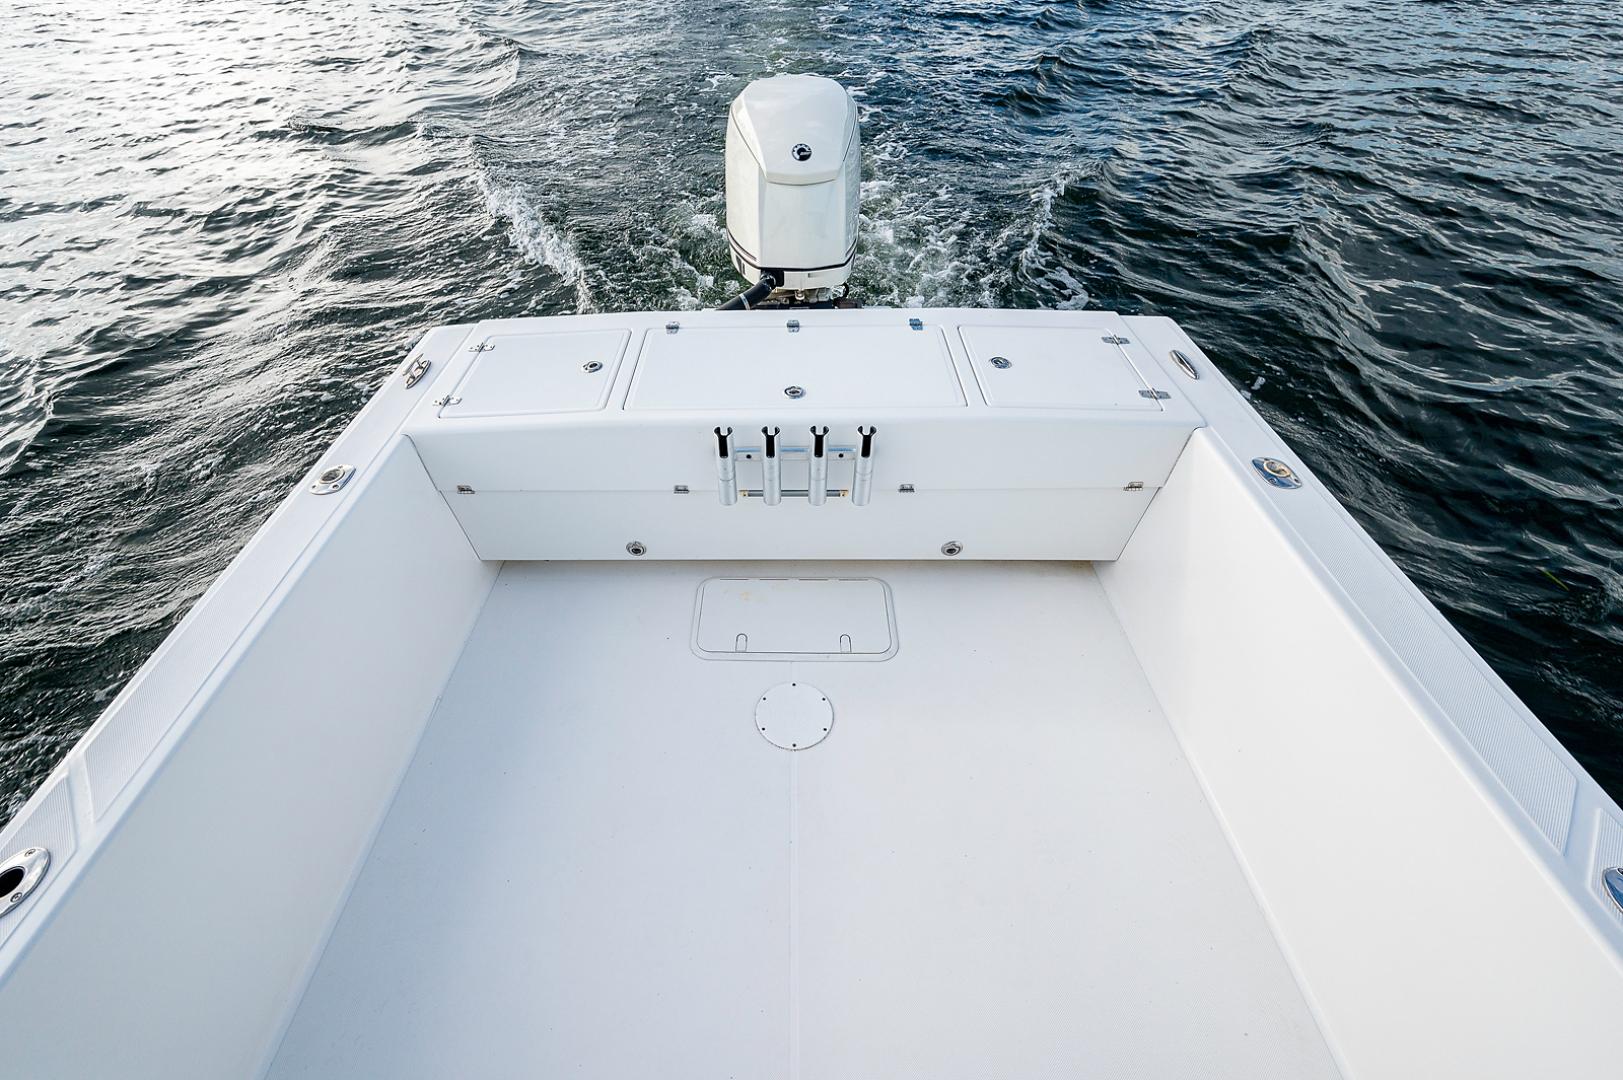 Ocean Master 2013-27 Ocean Master Palm Beach-Florida-United States-Cockpit-1501366 | Thumbnail